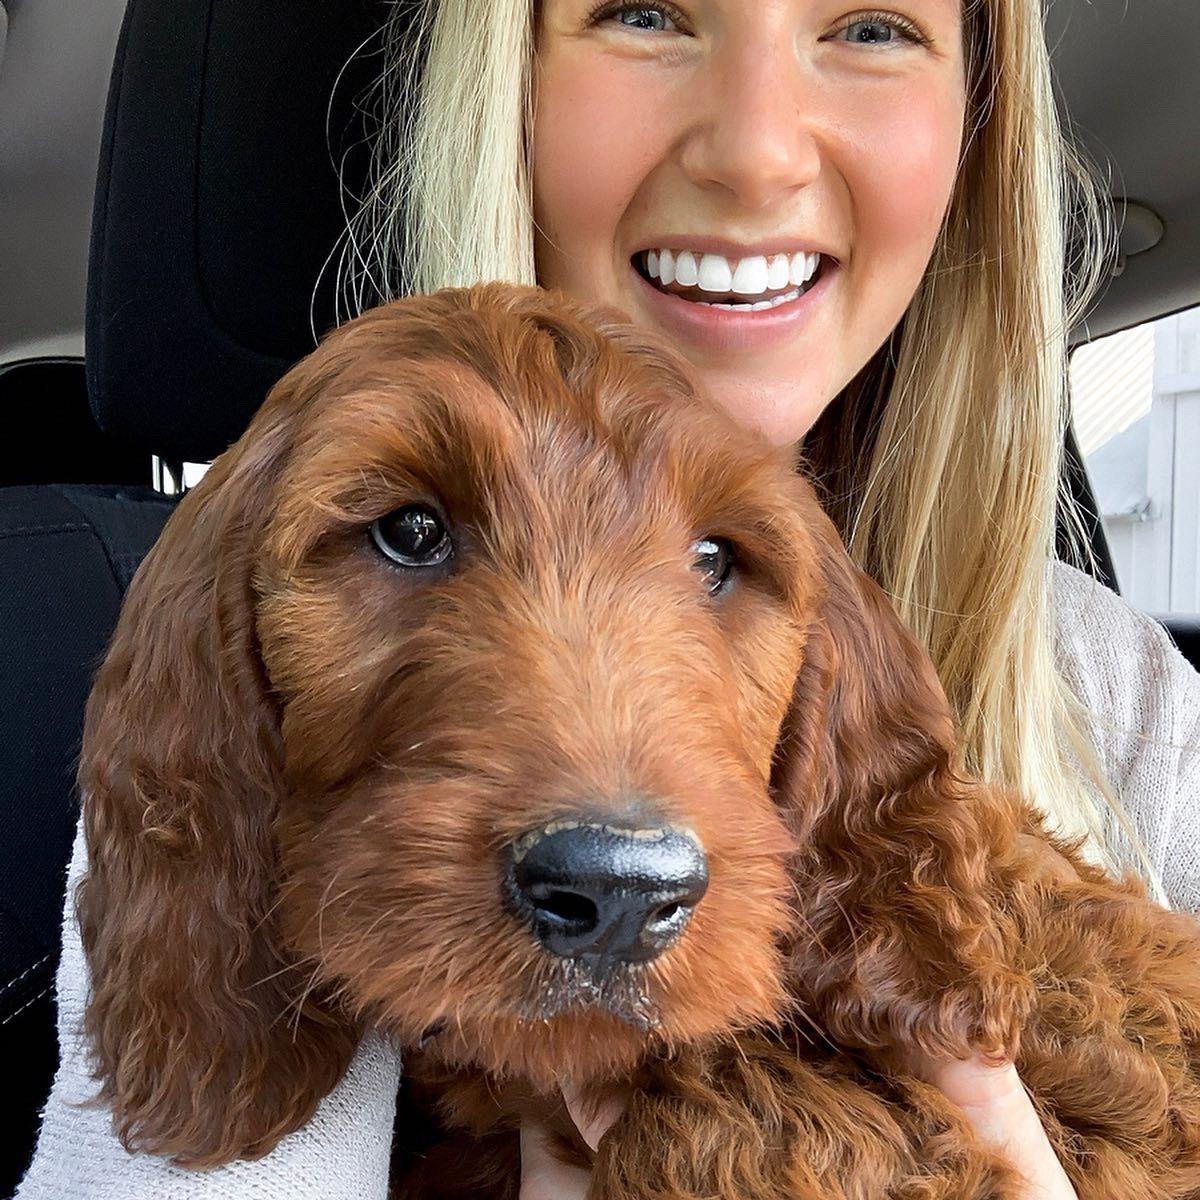 Newton 8 Weeks Old Irish Doodle See More On Instagram Macylenertz Irishdoodle Doodle Puppy Irish Doodle Doodles Irish